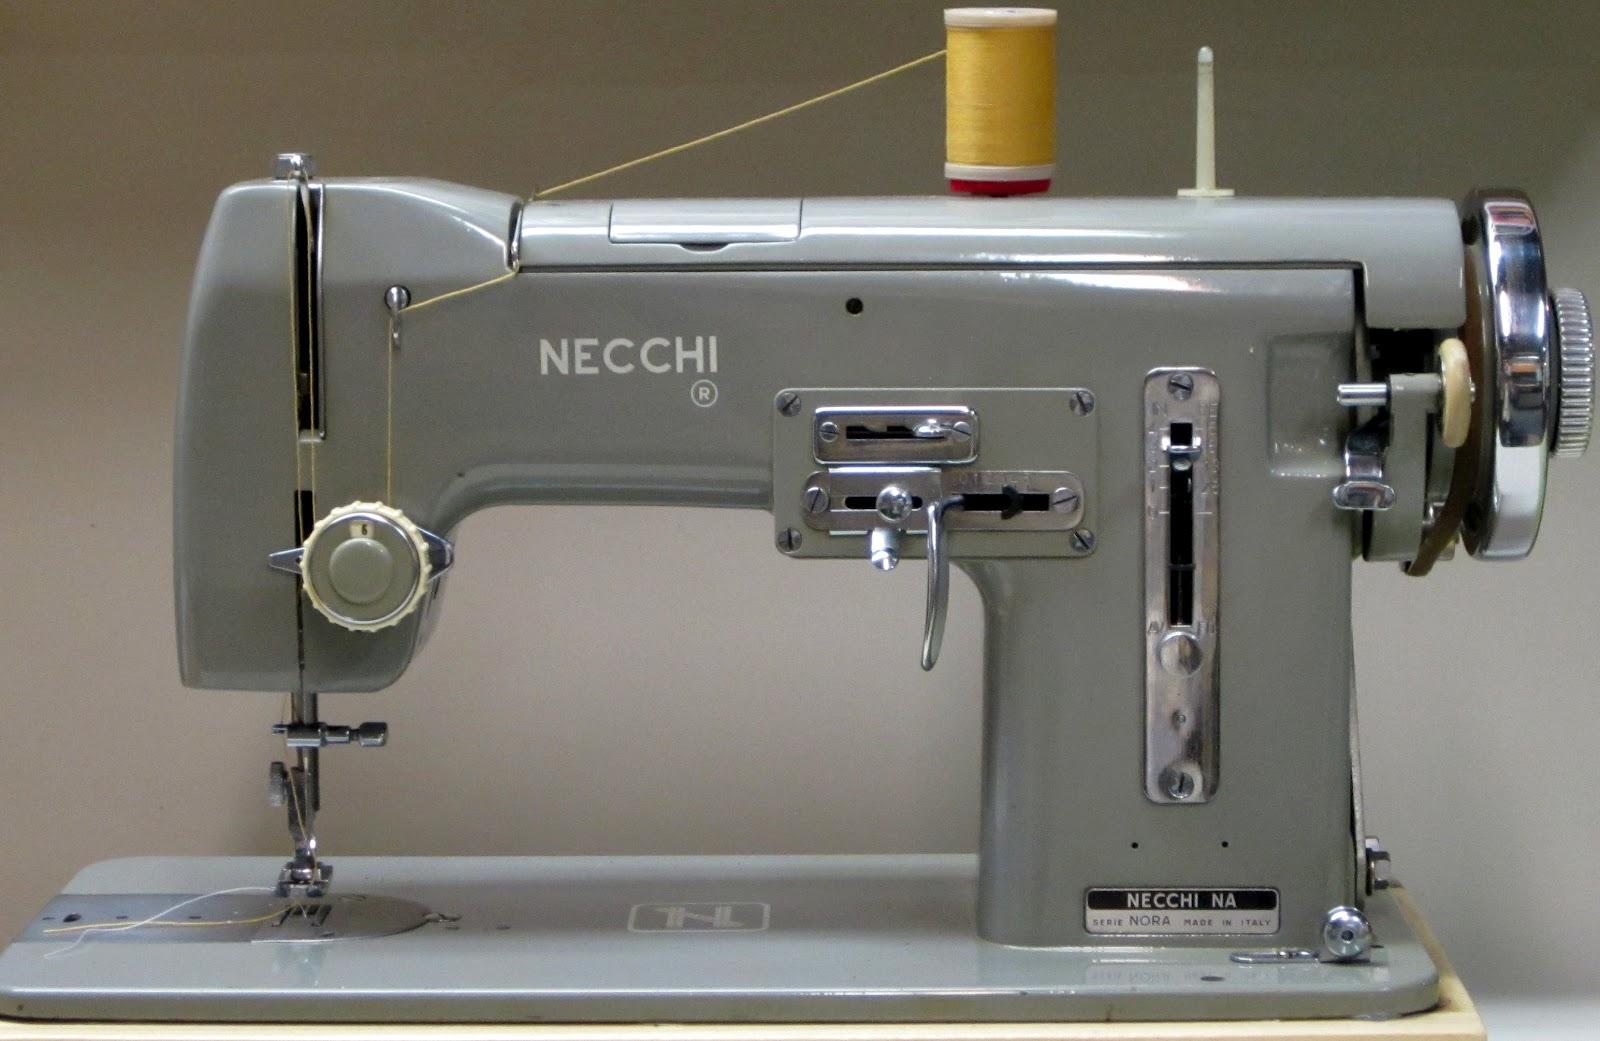 WRG-7916] Free Necchi Sewing Machine Manual | 2019 Ebook Liry